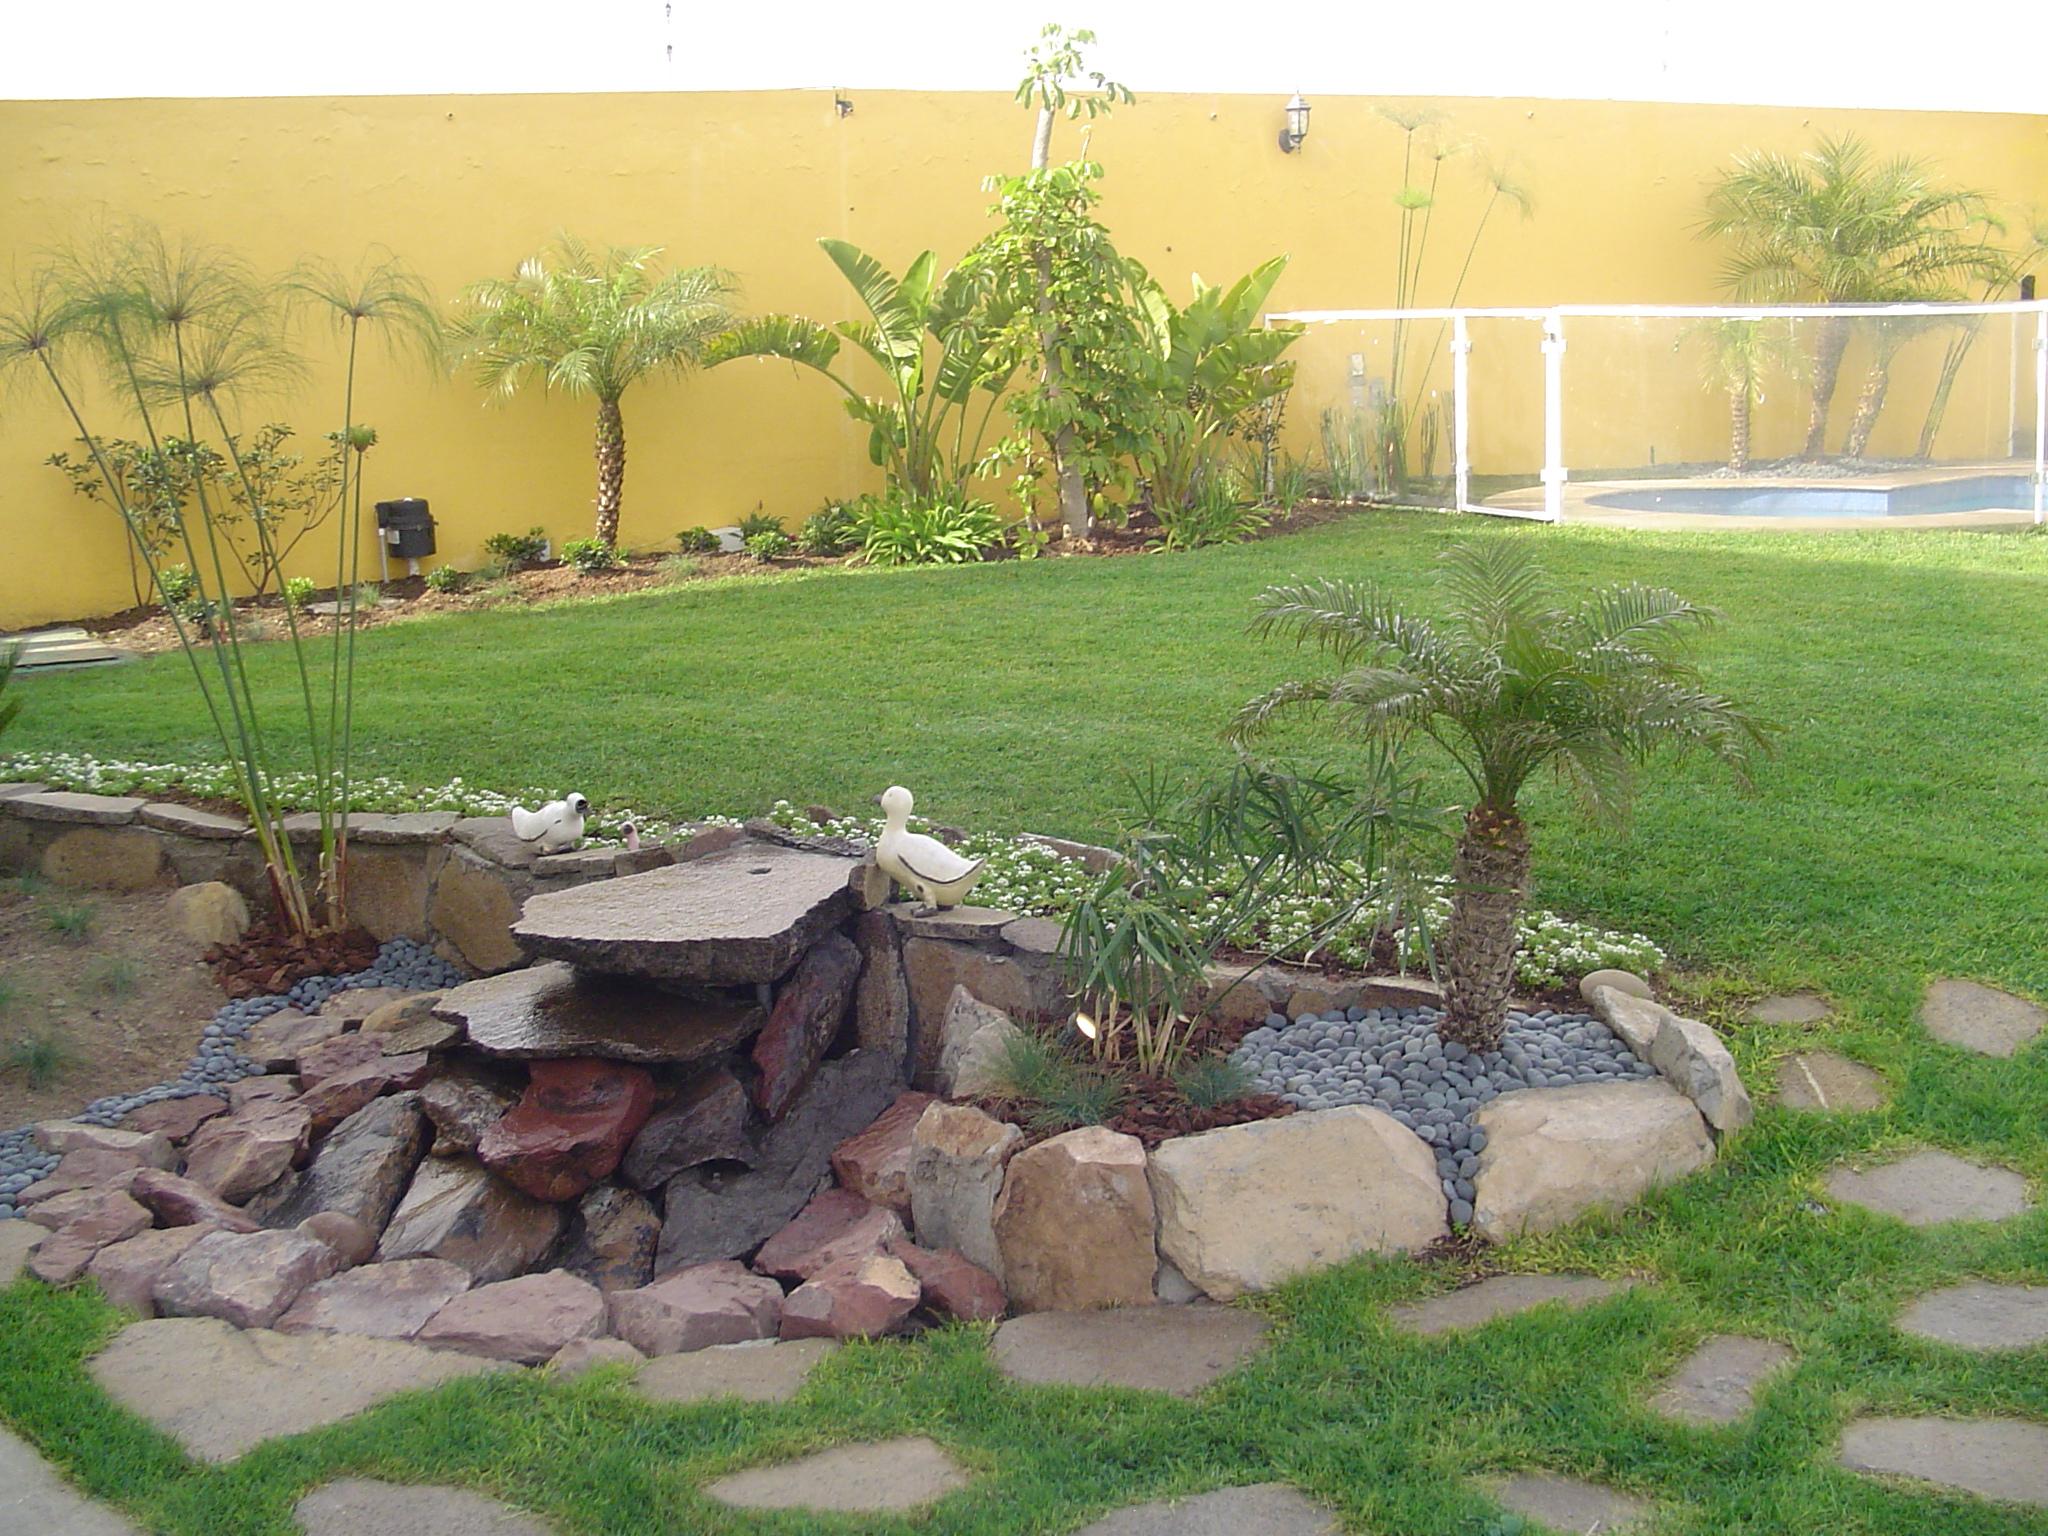 Venta de casas en tijuana infoisinfo autos weblog for Casas jardin veranda tijuana